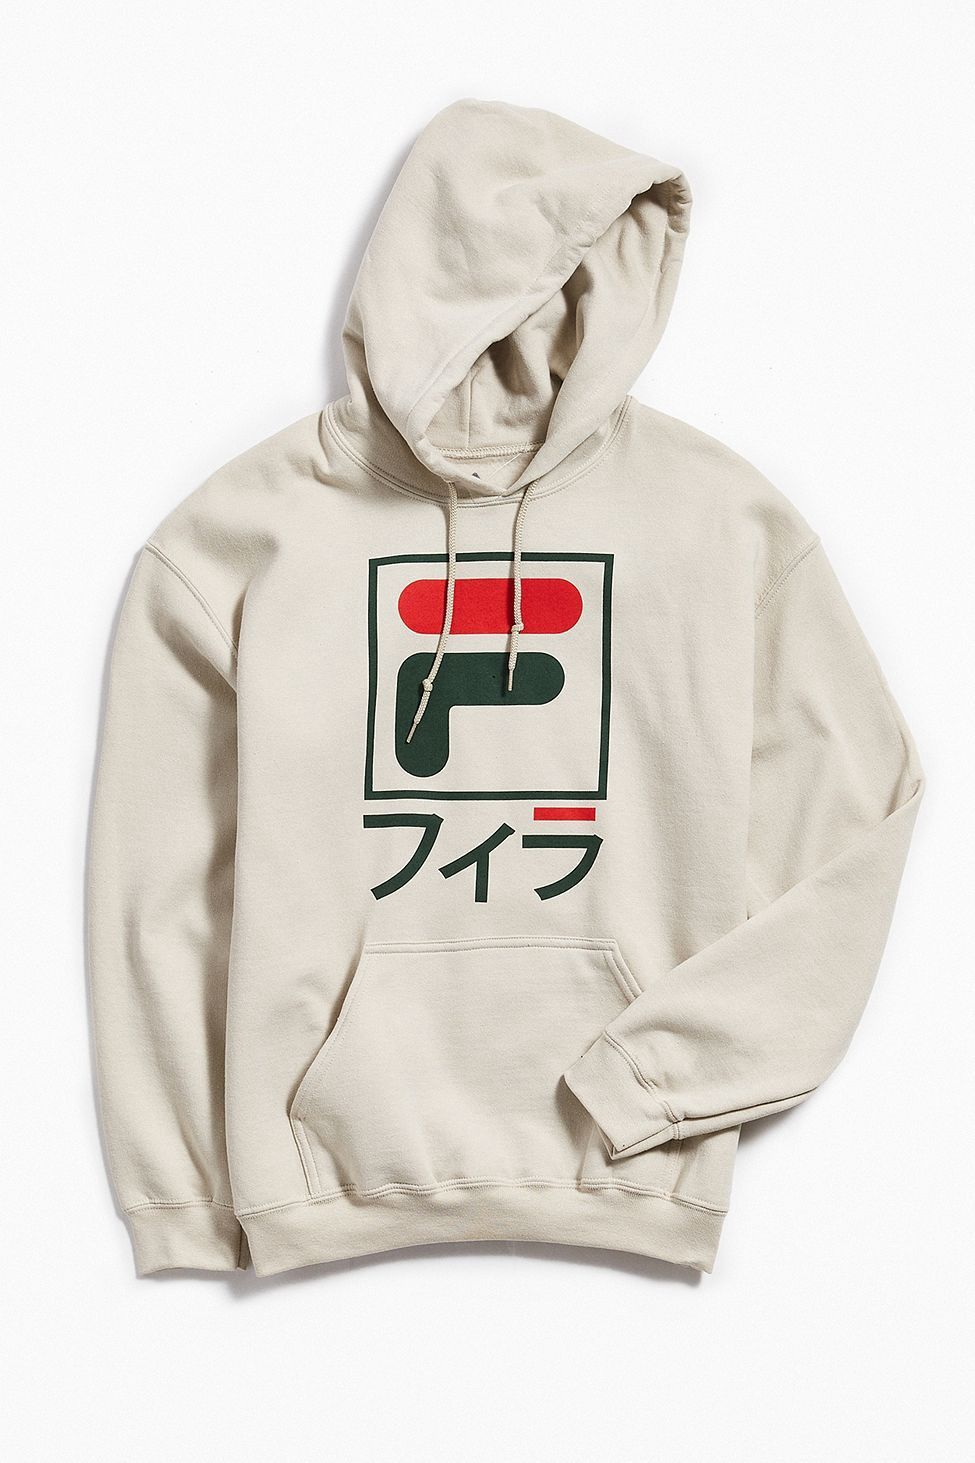 dc5b761a37 Urban Outfitters Fila International Sport Hoodie Sweatshirt - Gold M ...